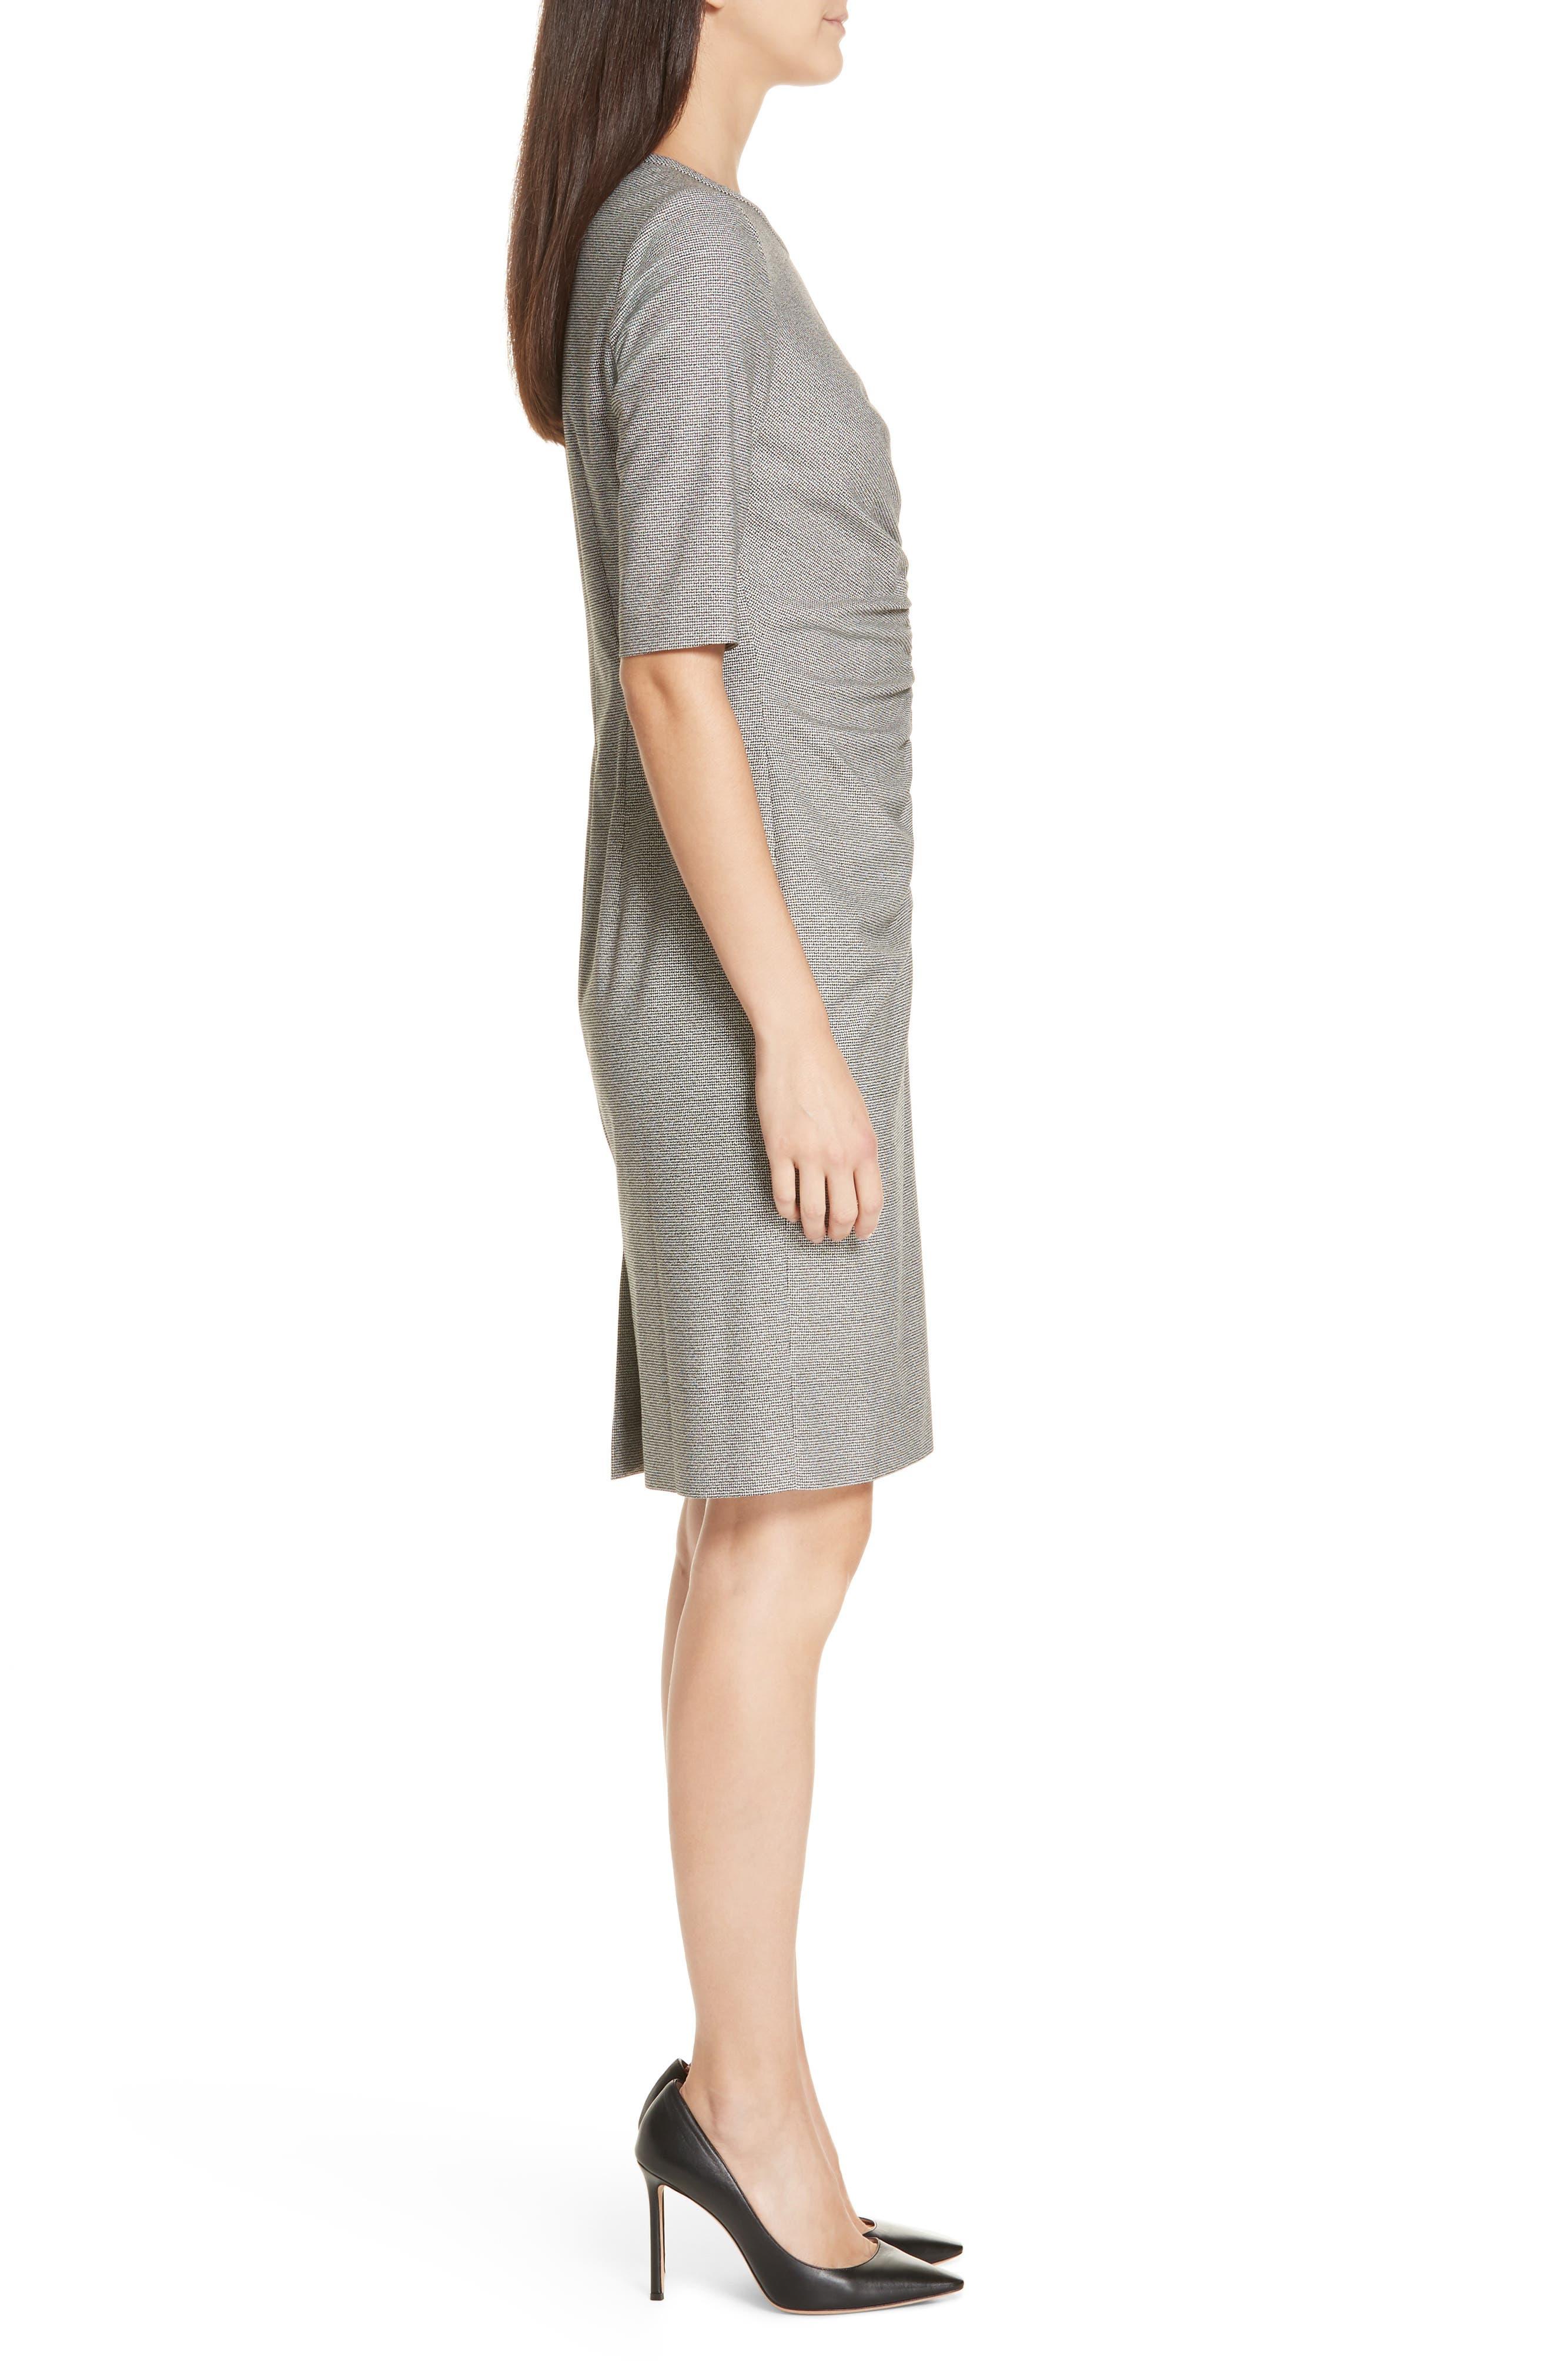 Dirafia Blurred Optic Dress,                             Alternate thumbnail 3, color,                             BLACK FANTASY